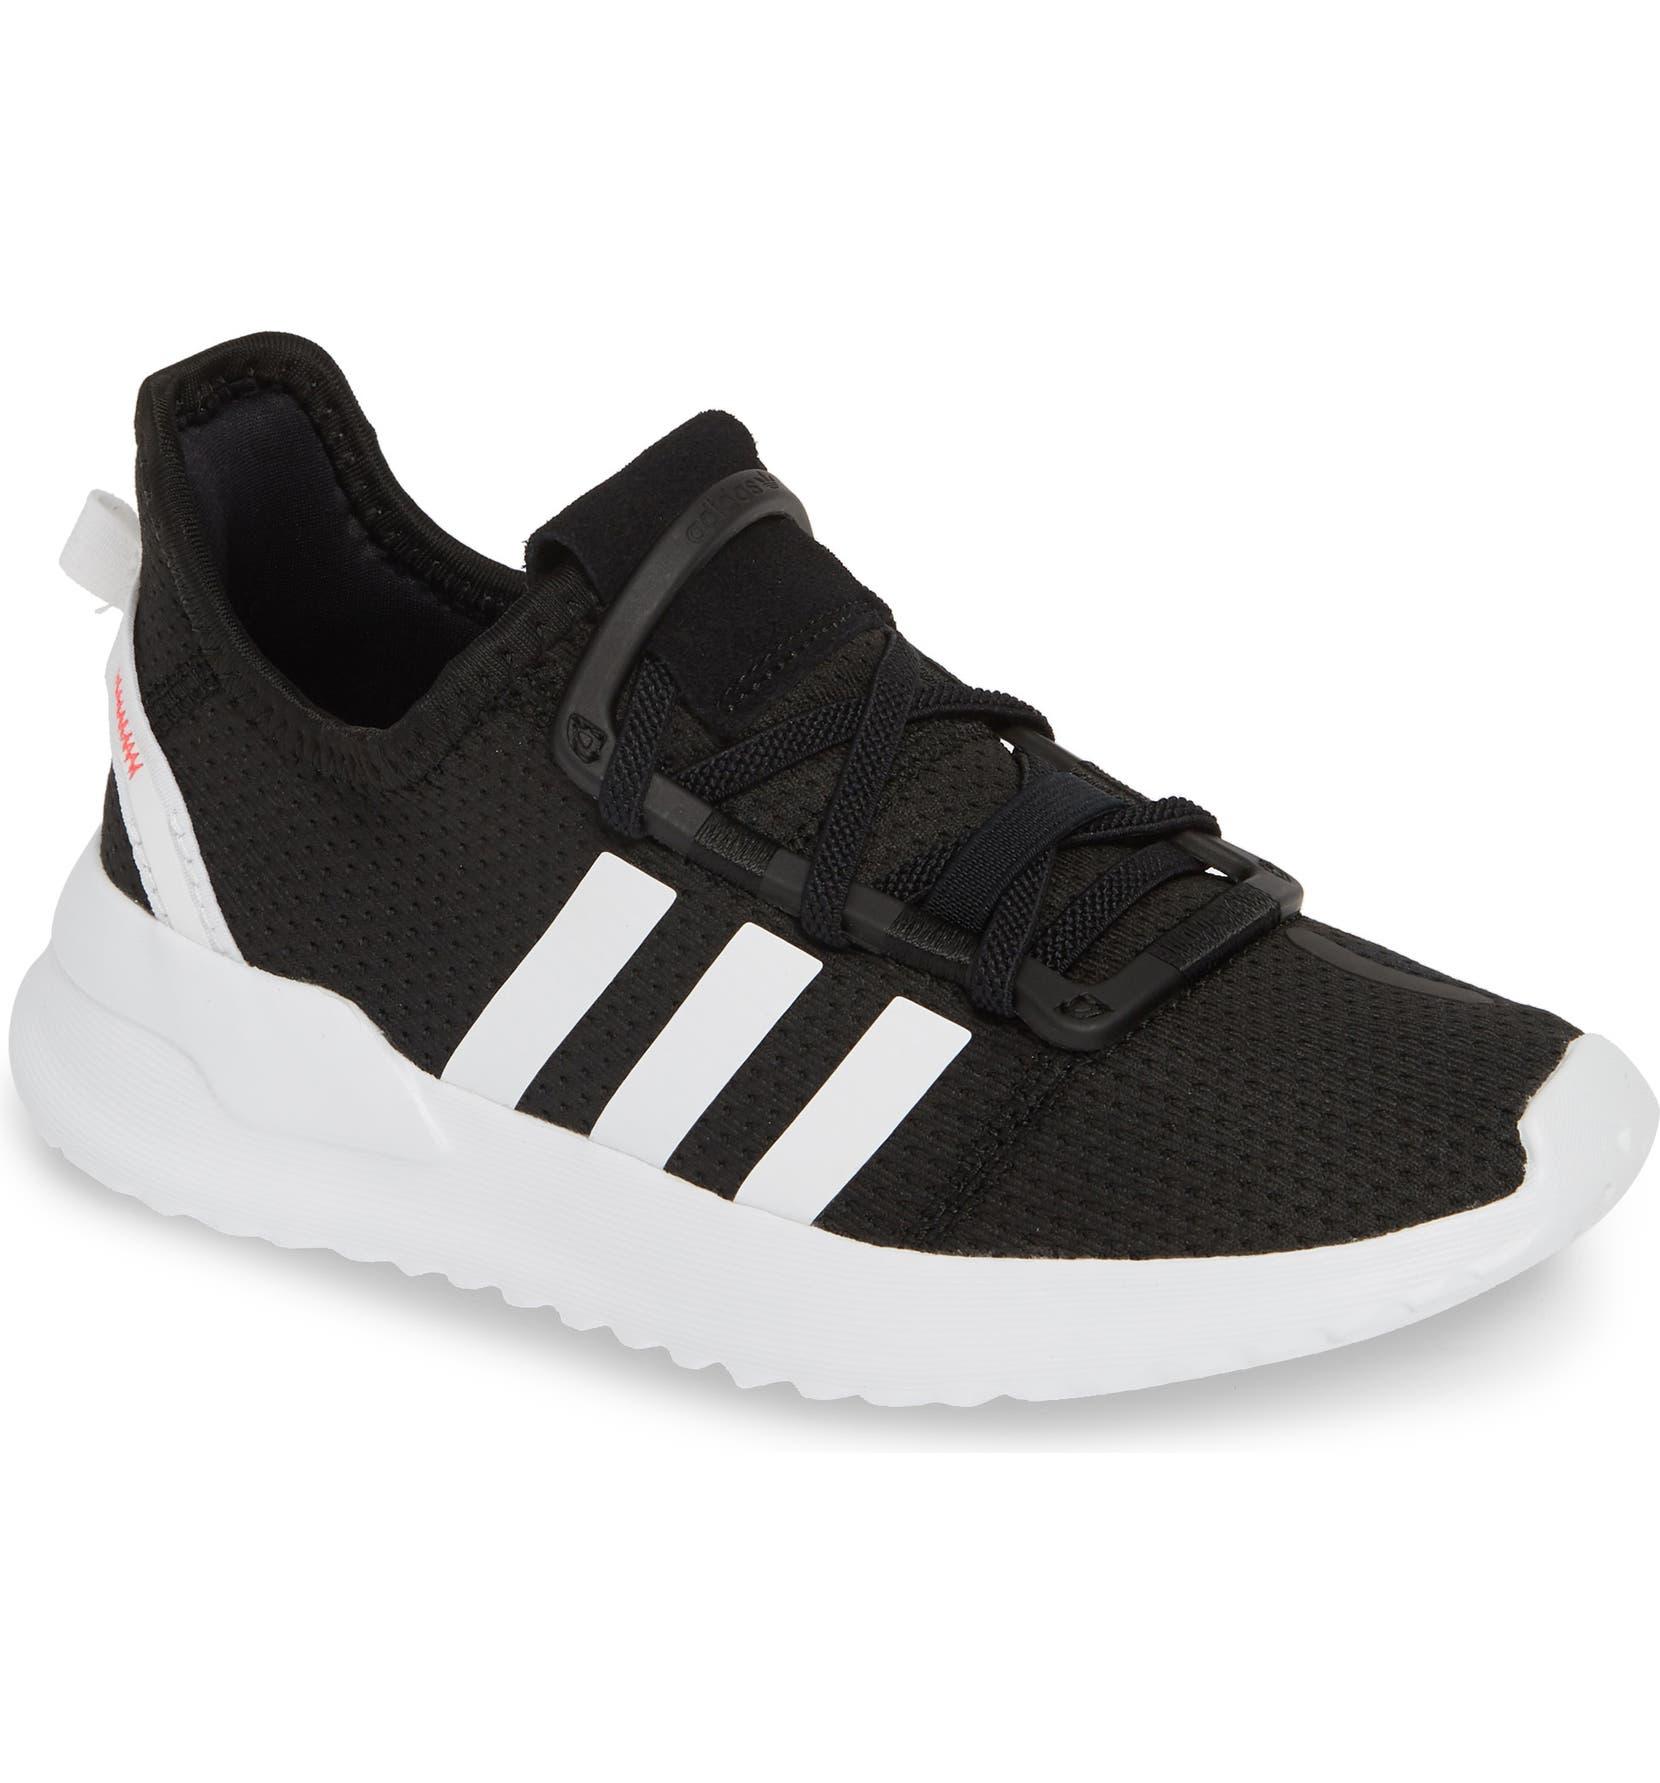 sports shoes 4b65a 502c7 adidas U-Path Run Sneaker (Baby, Walker, Toddler, Little Kid  Big Kid)   Nordstrom